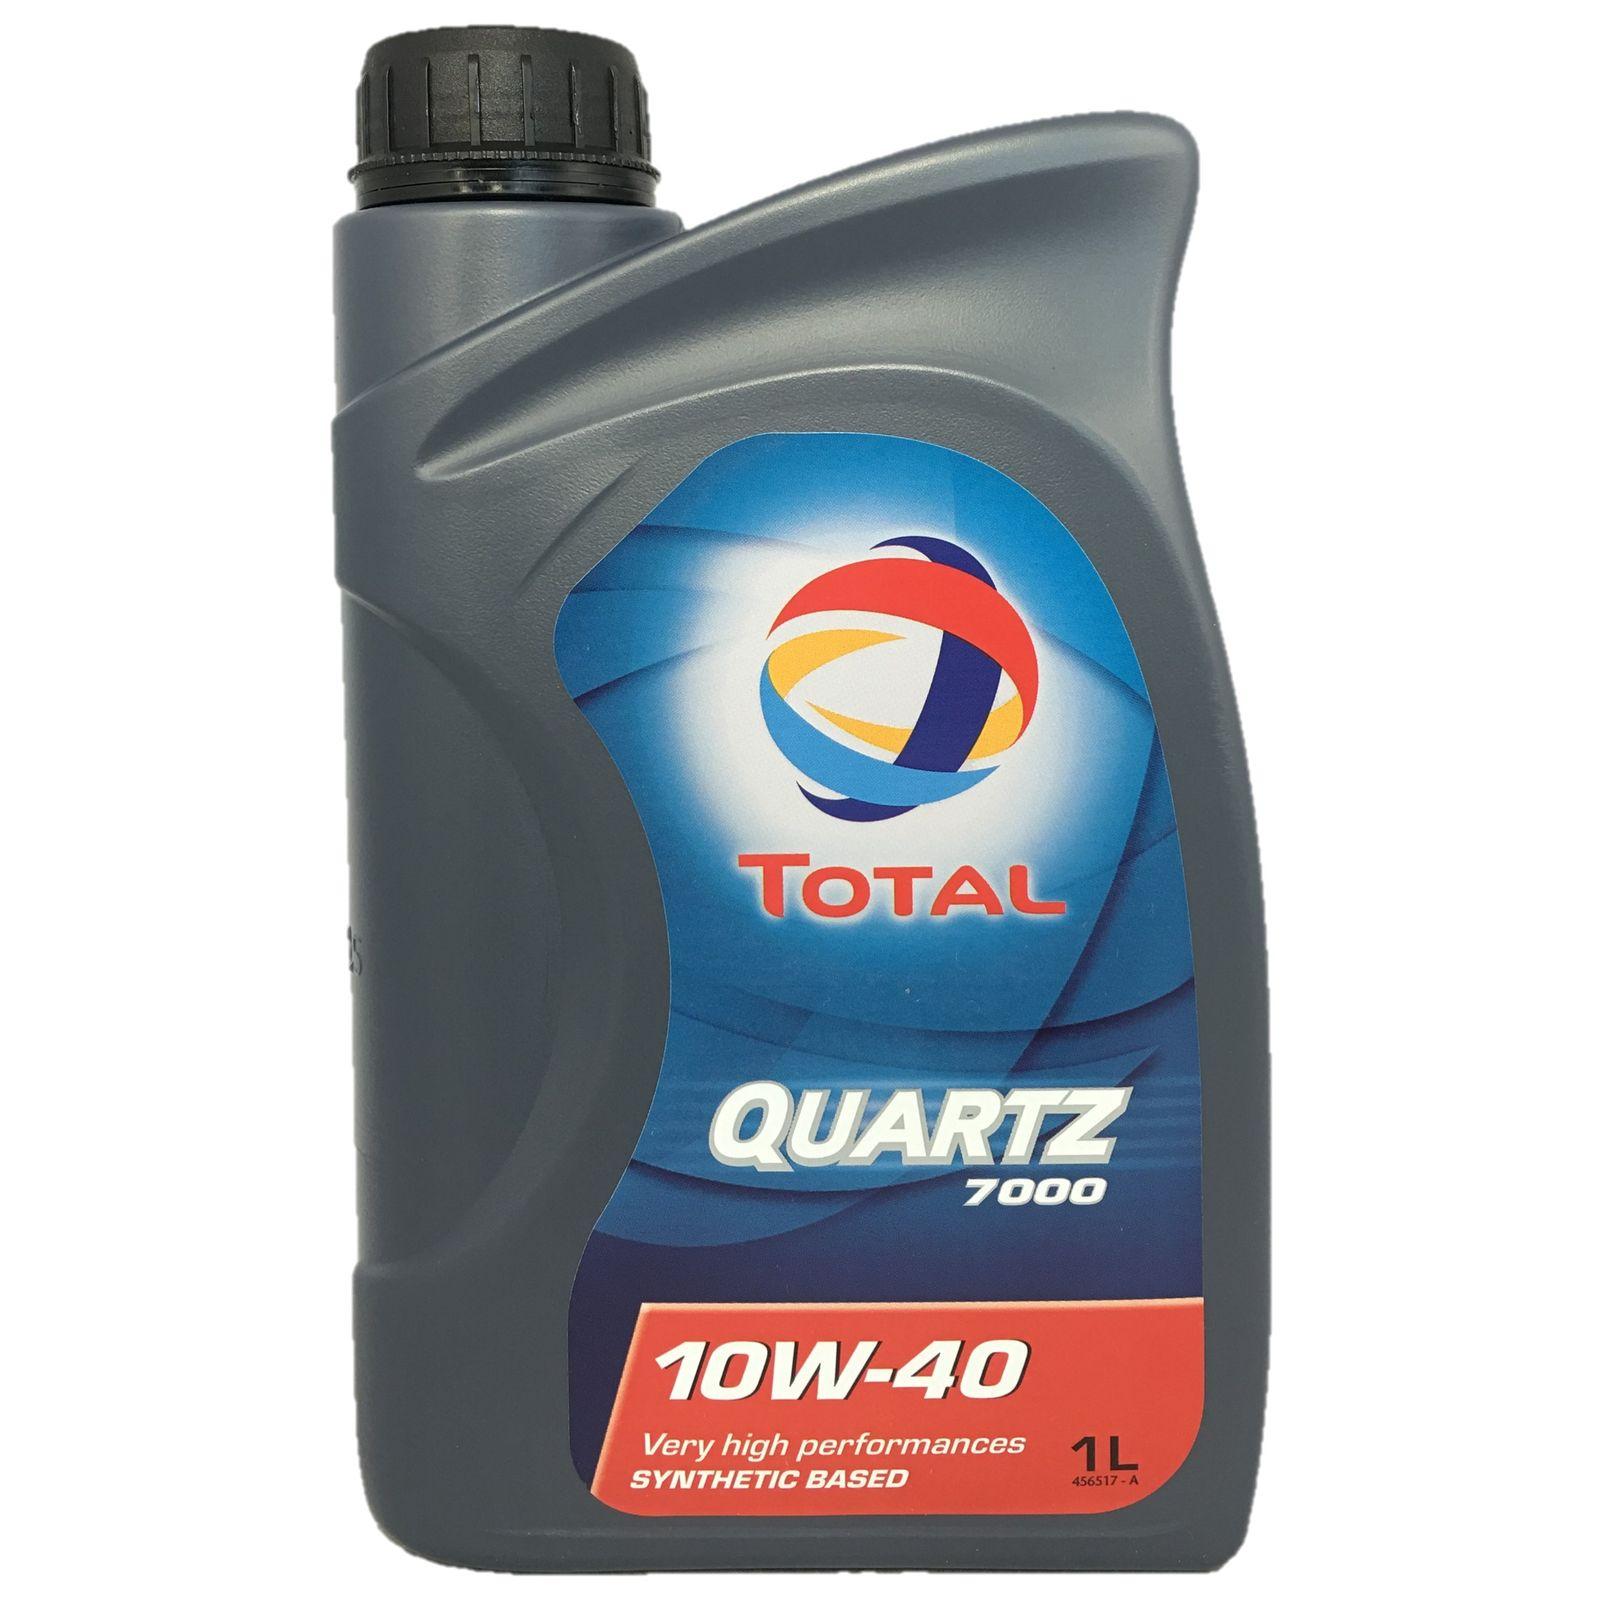 1 Liter TOTAL QUARTZ 7000 10W-40